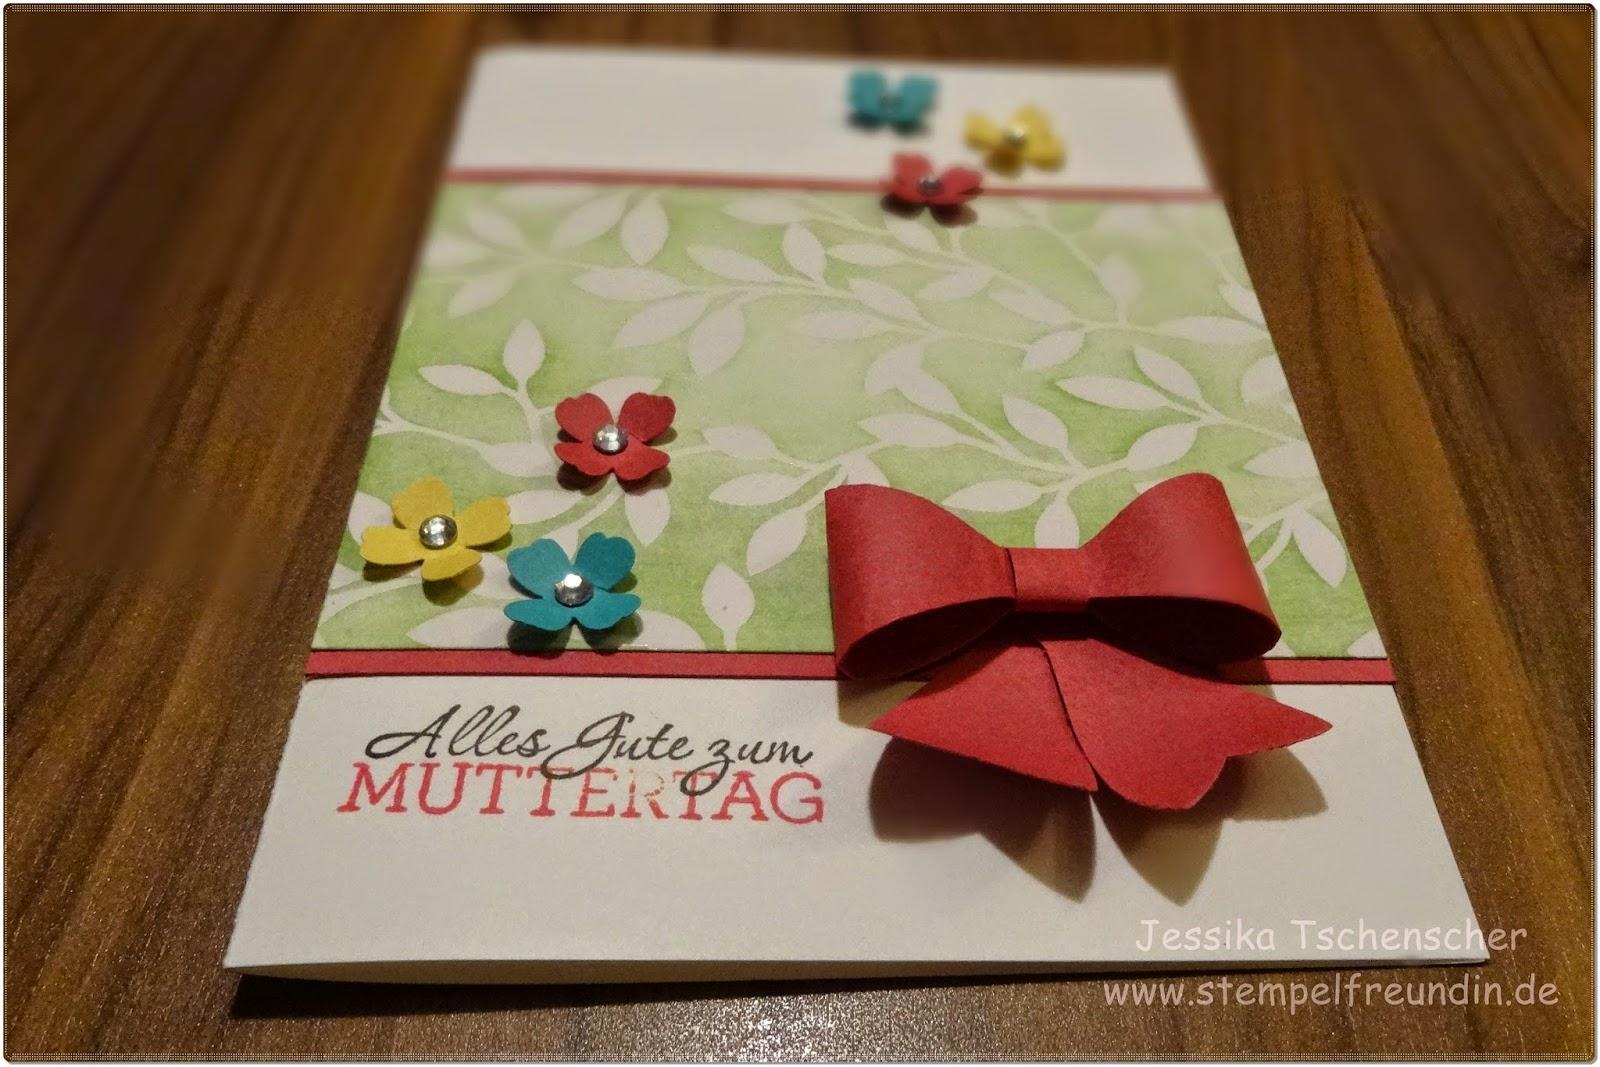 SAB 2015, Stampin' Up!, Muttertag, Itty Bitty Stanzen, Schleife, www.stempelfreundin.de